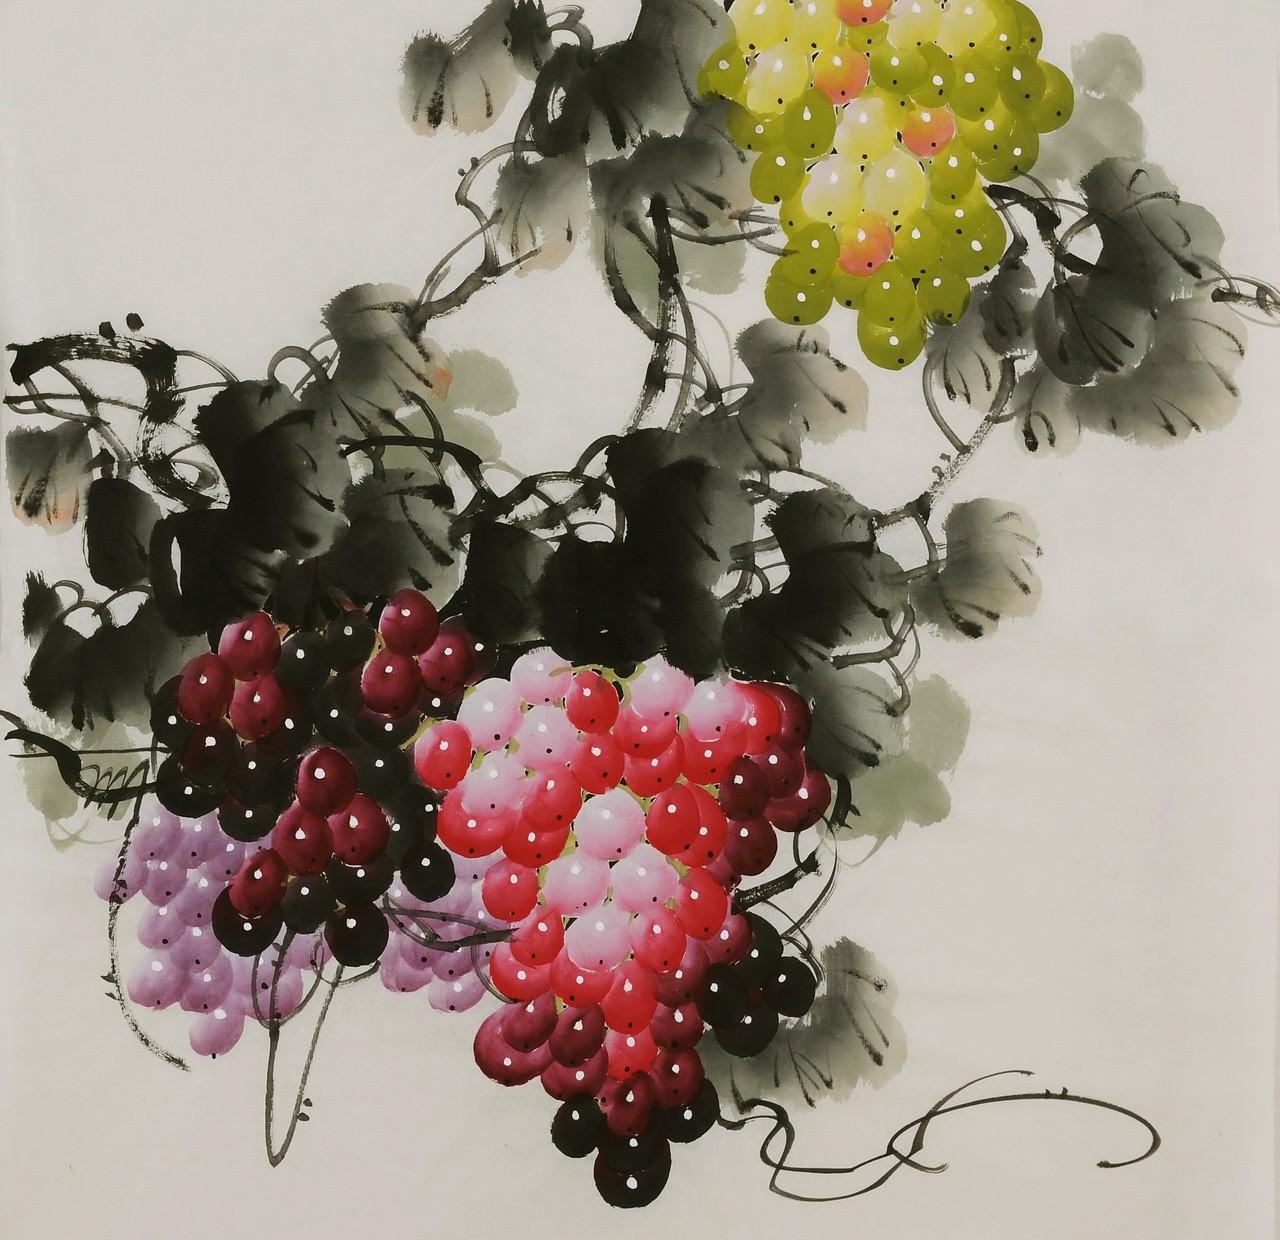 Grapes - CNAG005838